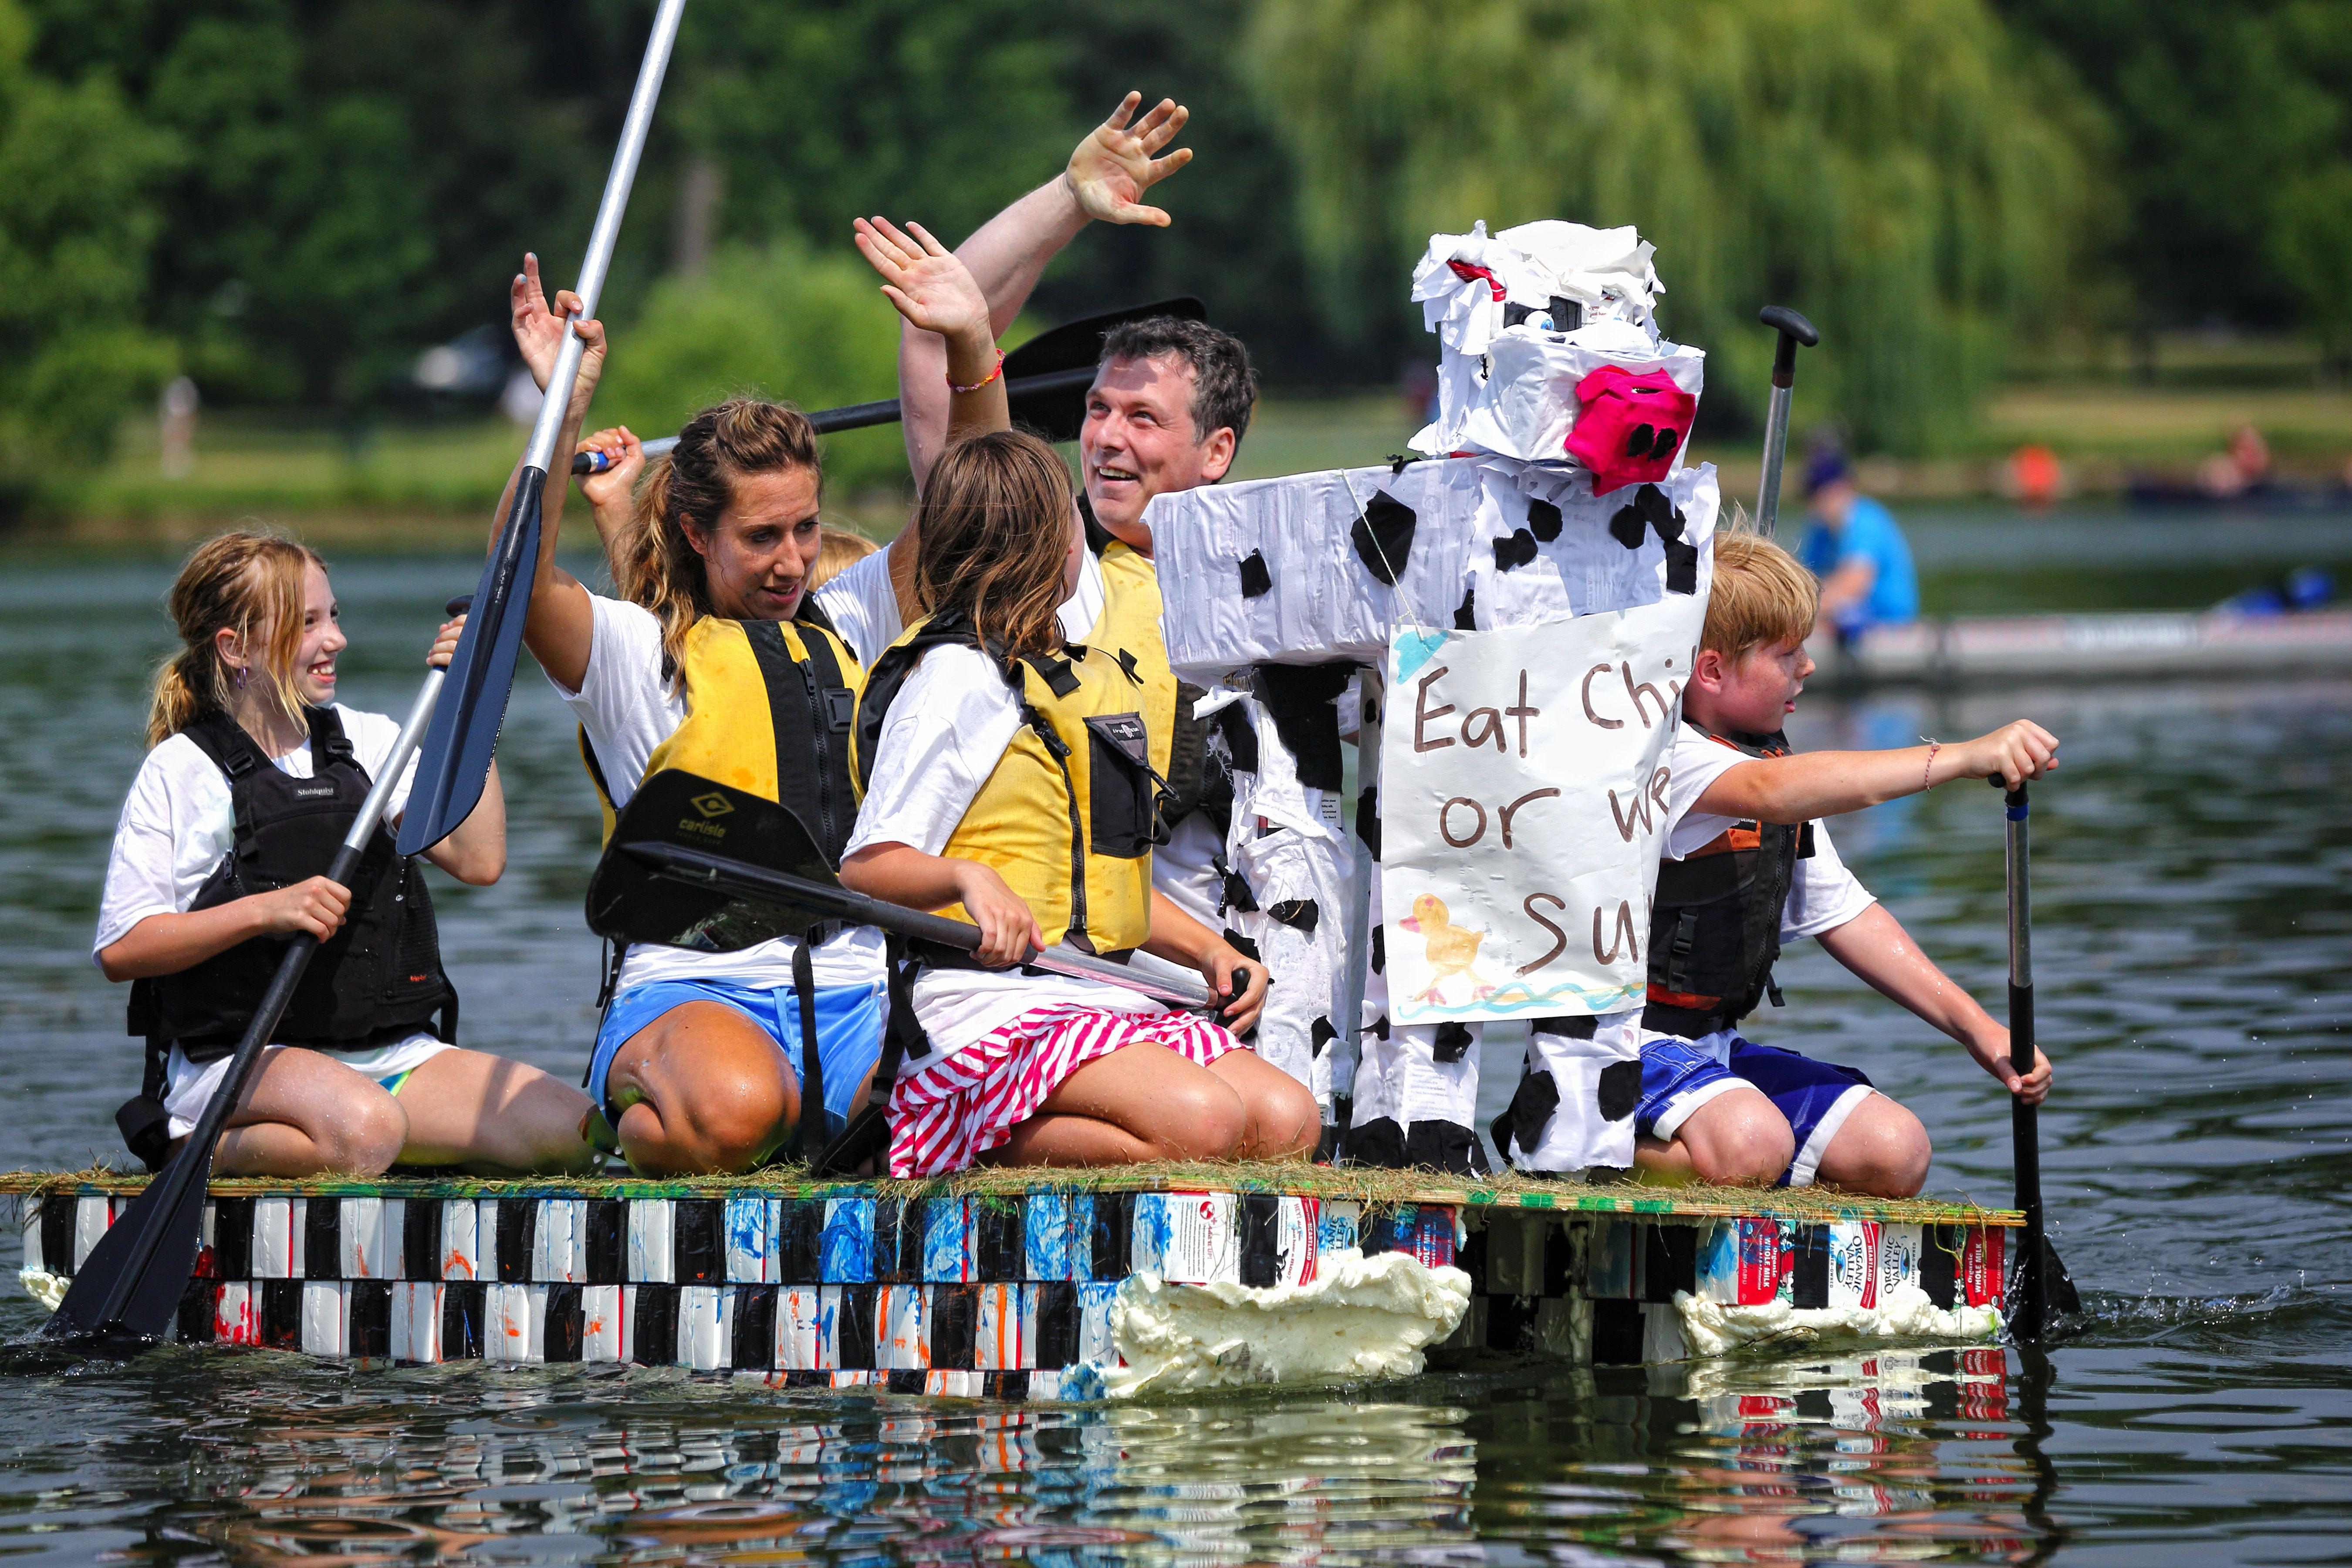 Aquatennial milk carton boat races during the 2012 Star